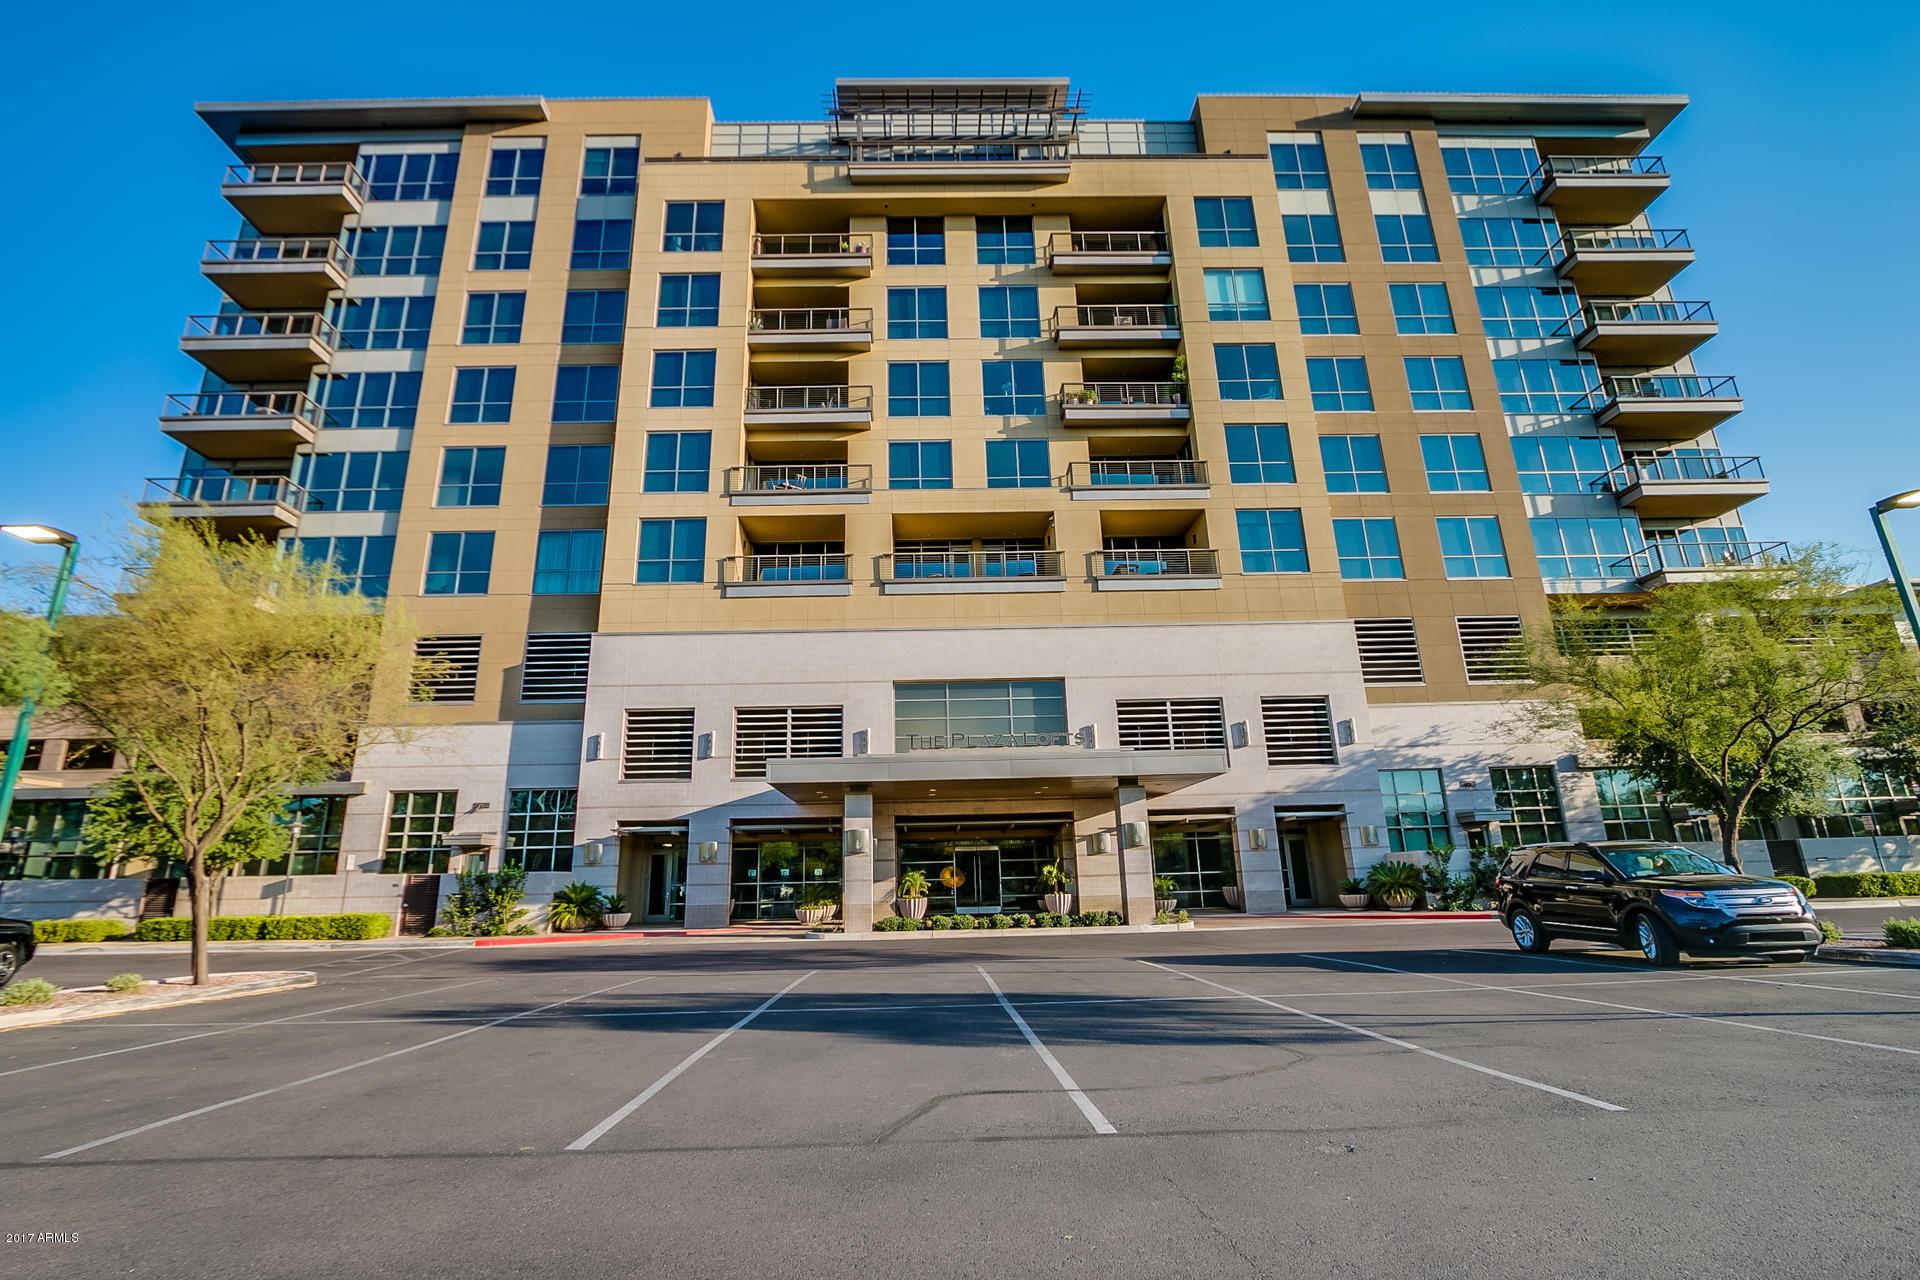 MLS 5841482 15215 N KIERLAND Boulevard Unit 934, Scottsdale, AZ 85254 Scottsdale AZ Condo or Townhome